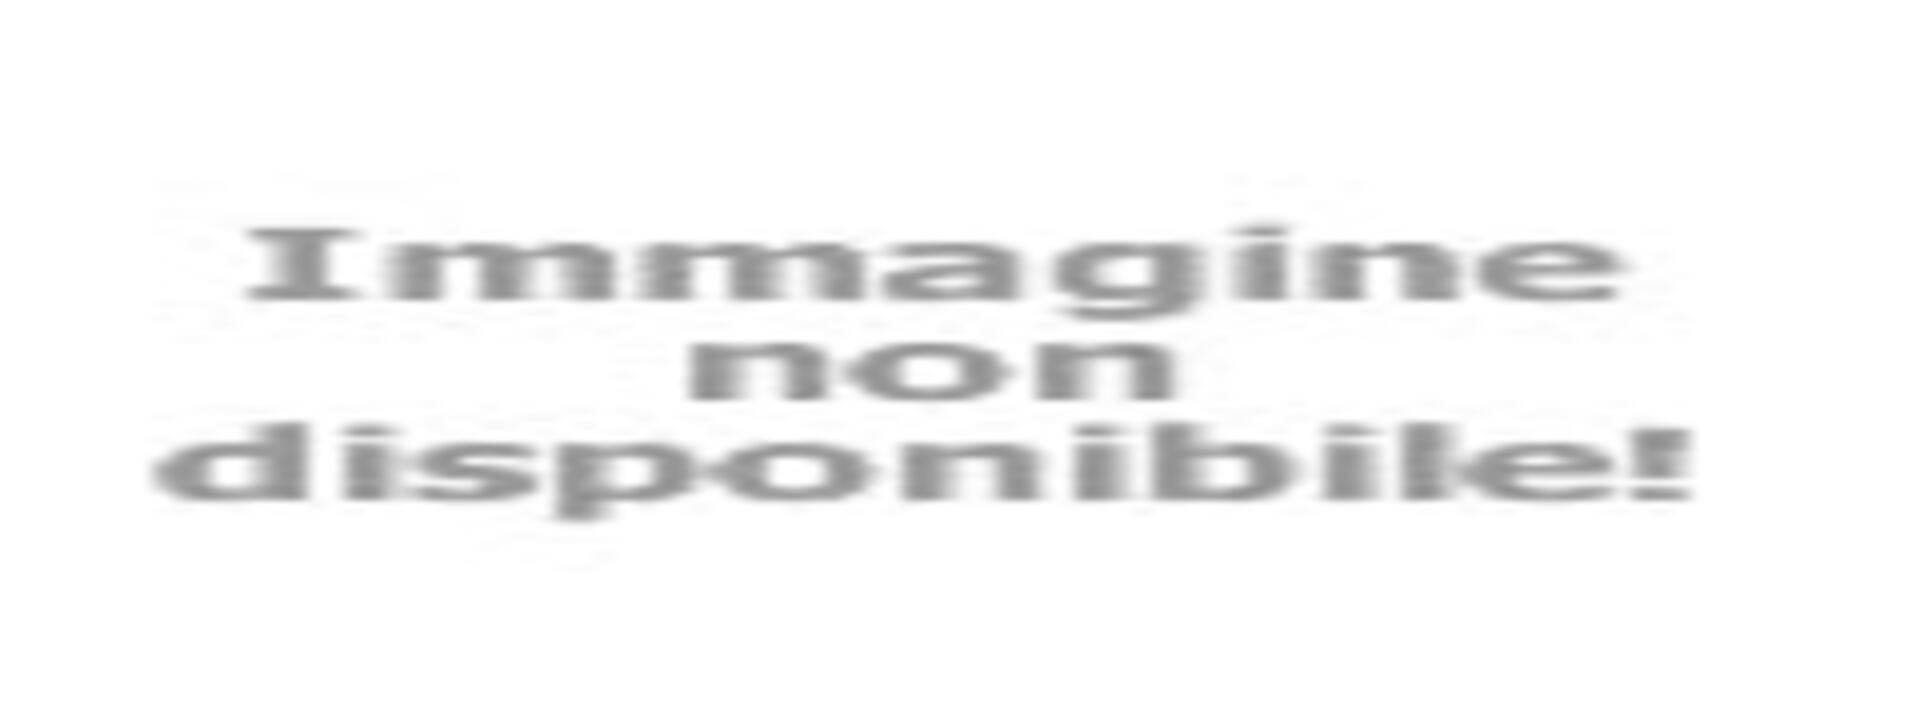 sangregorioresidencehotel it chi-siamo 004